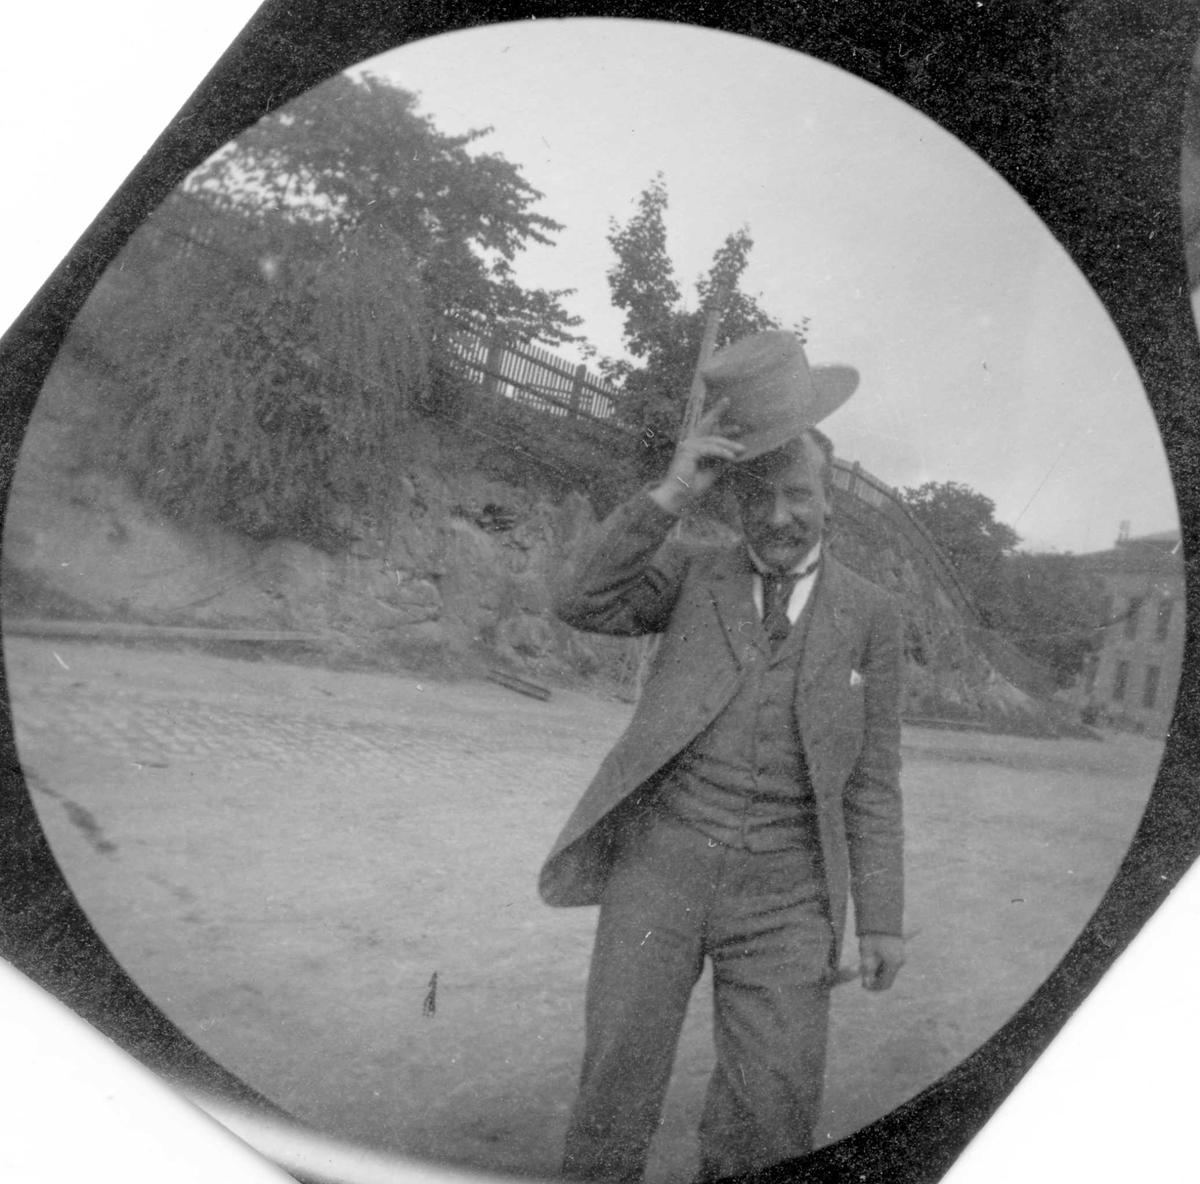 Hr. Fischer, bror til Petter Fischer står i park og letter på hatten.